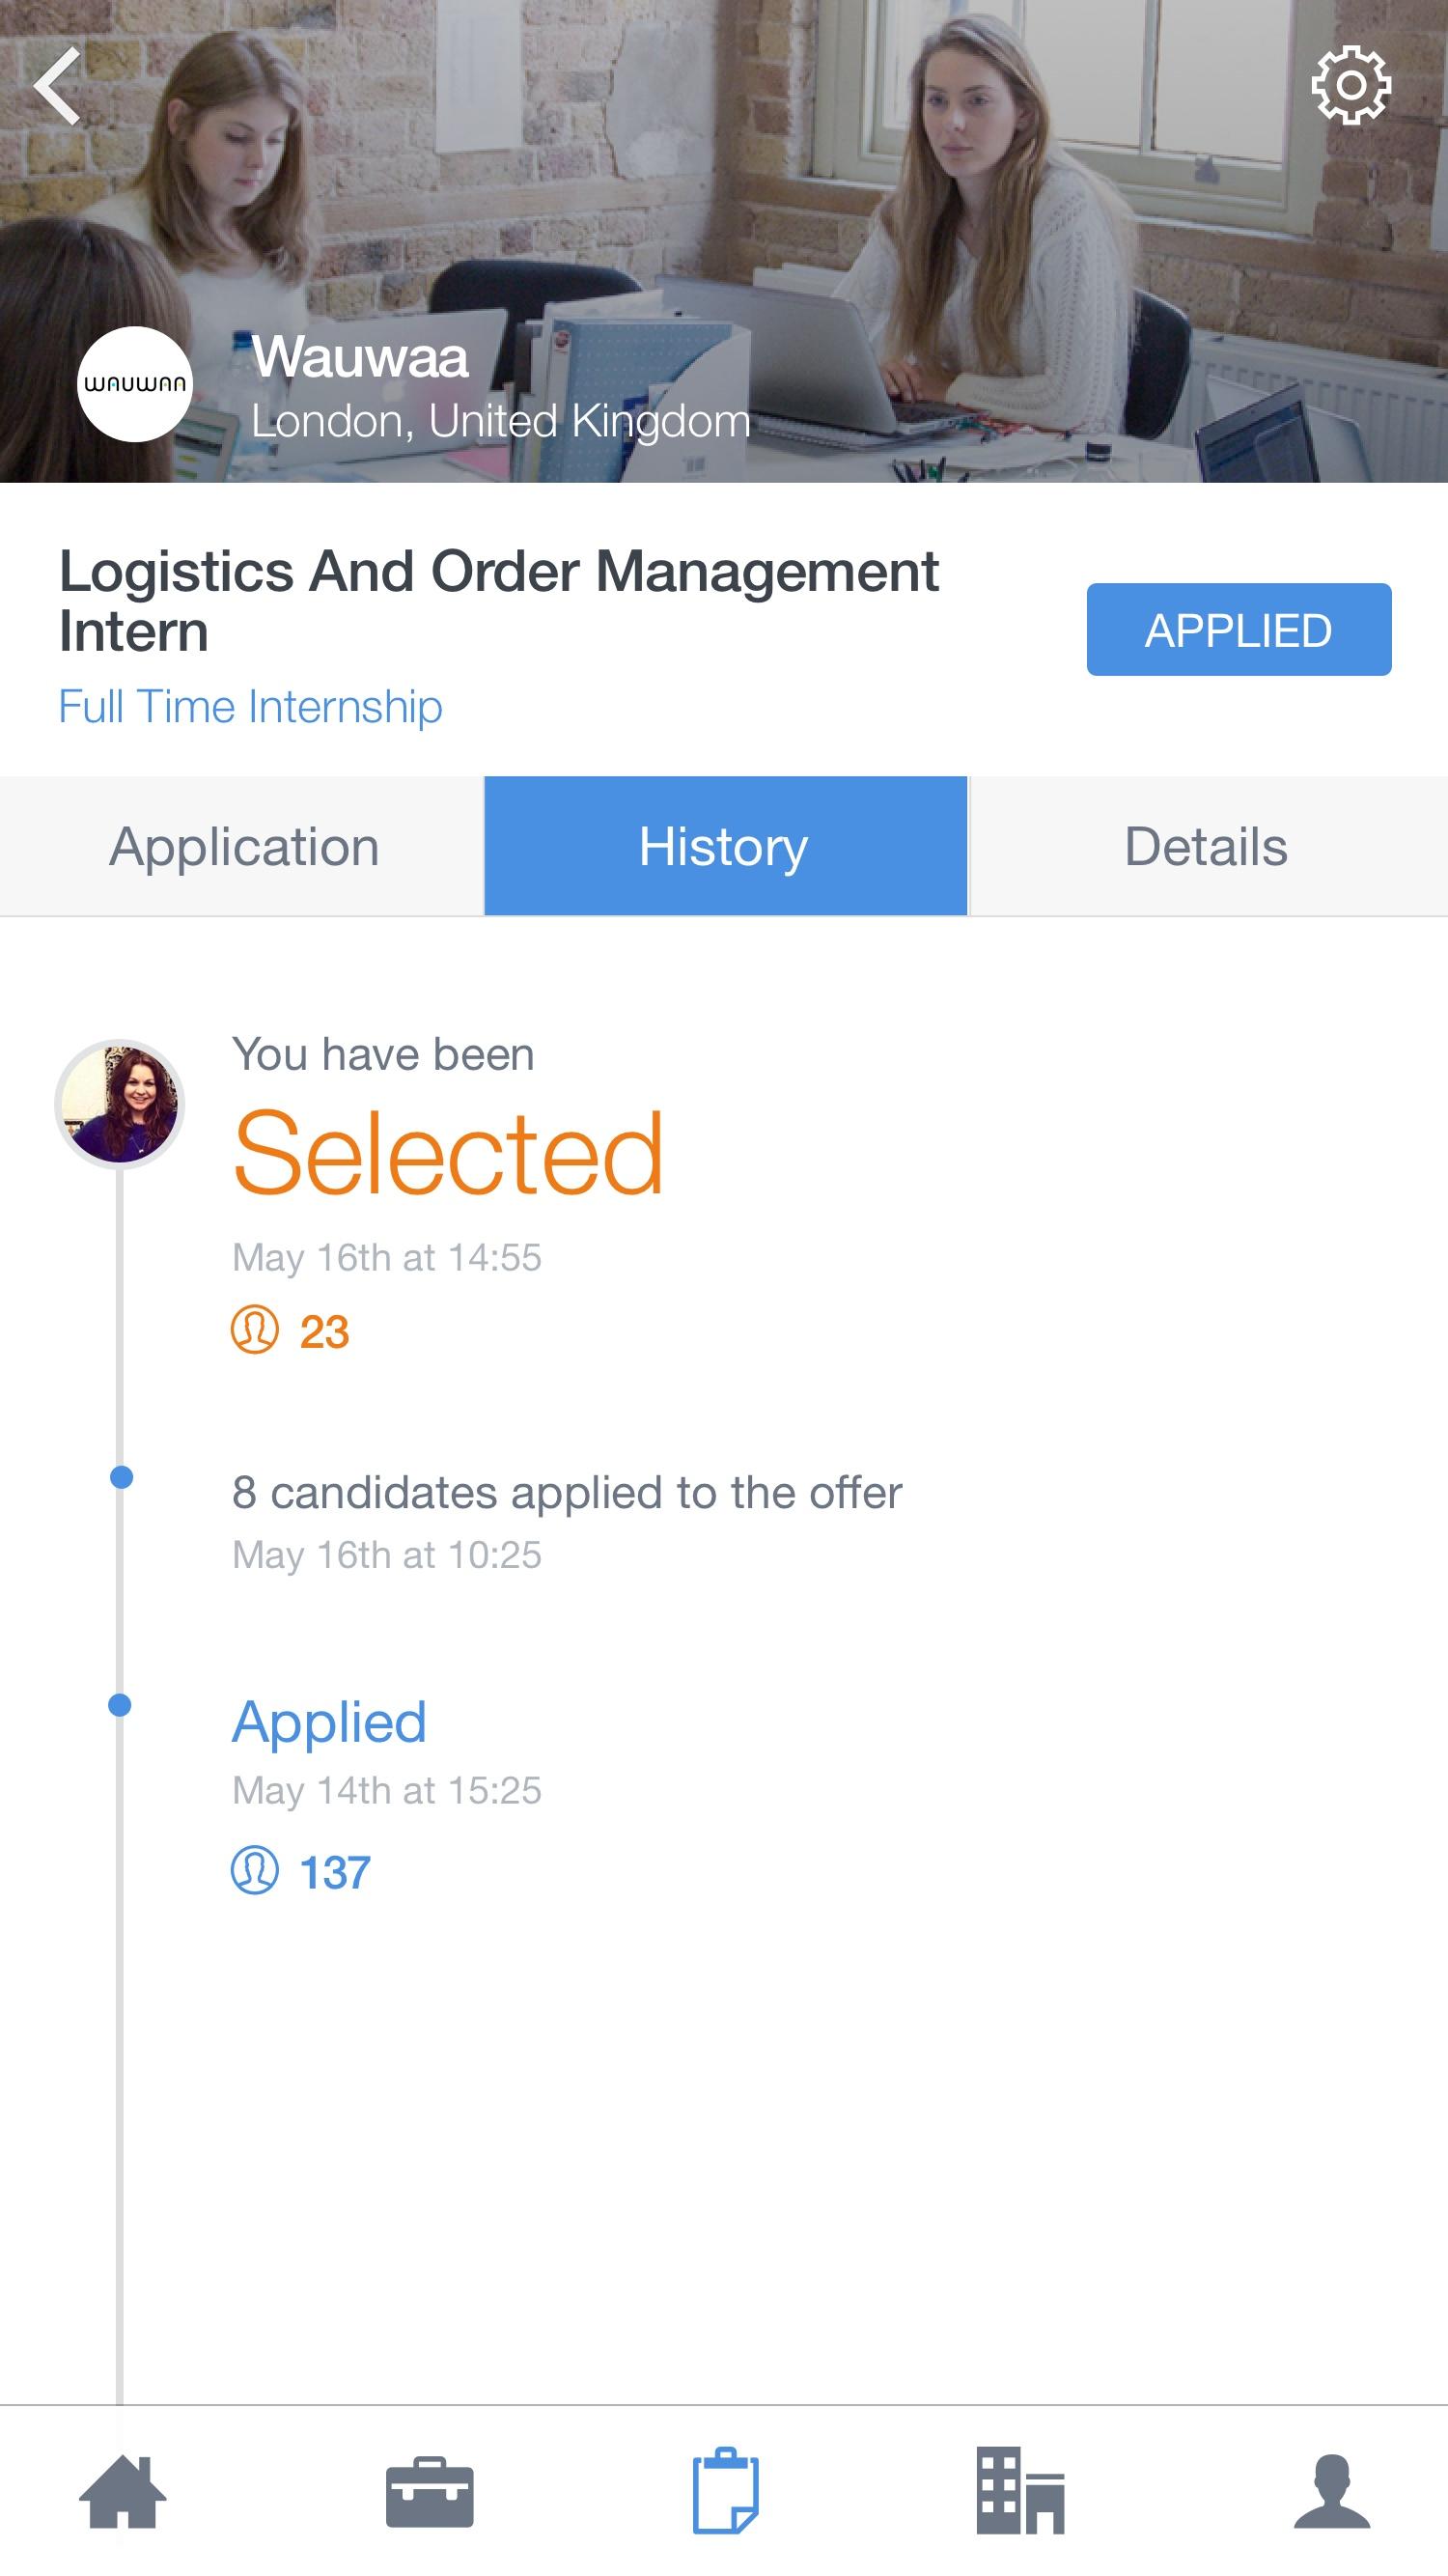 Application – History